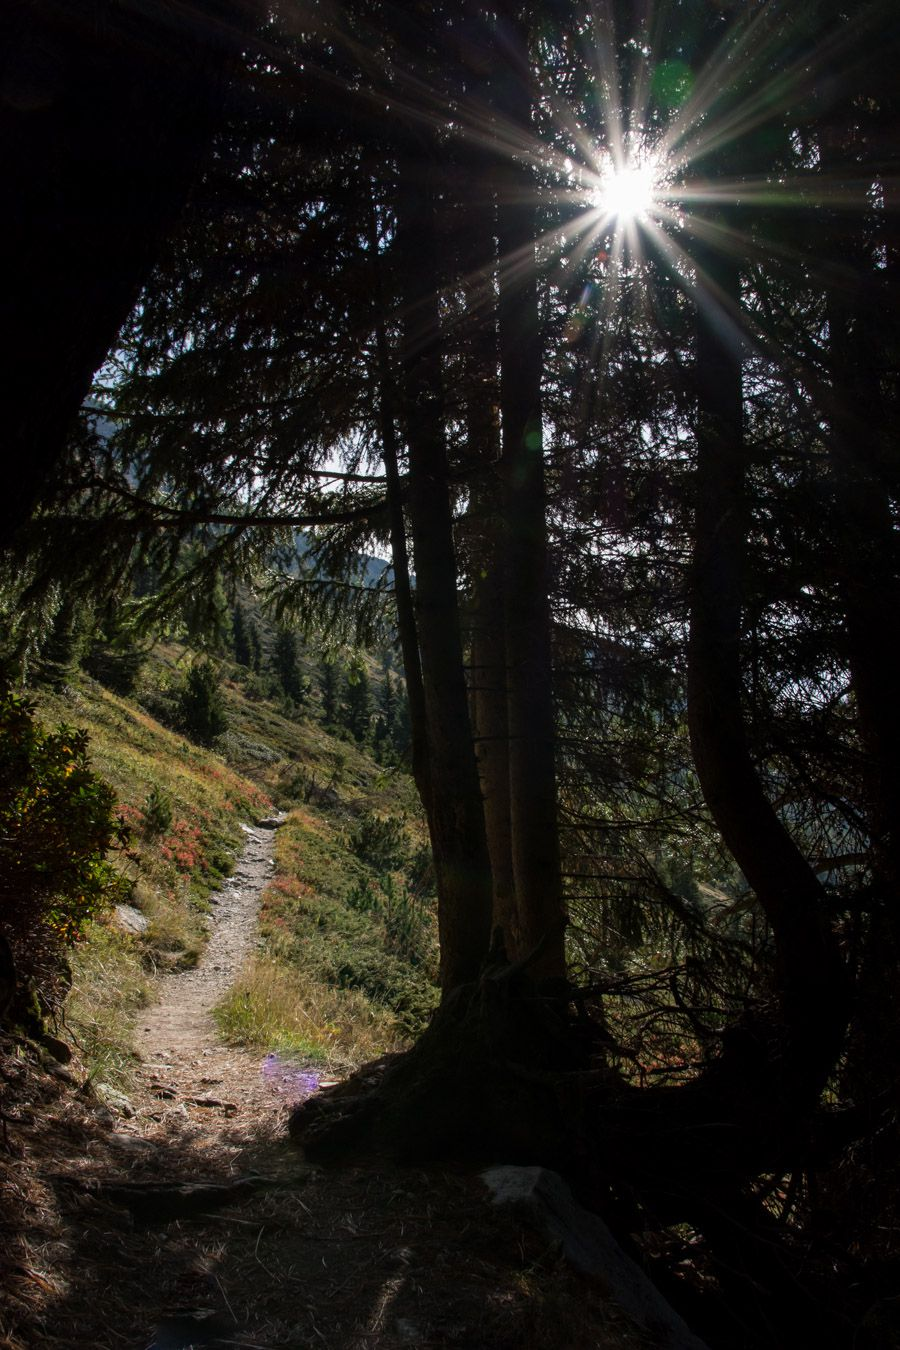 Automne en Maurienne